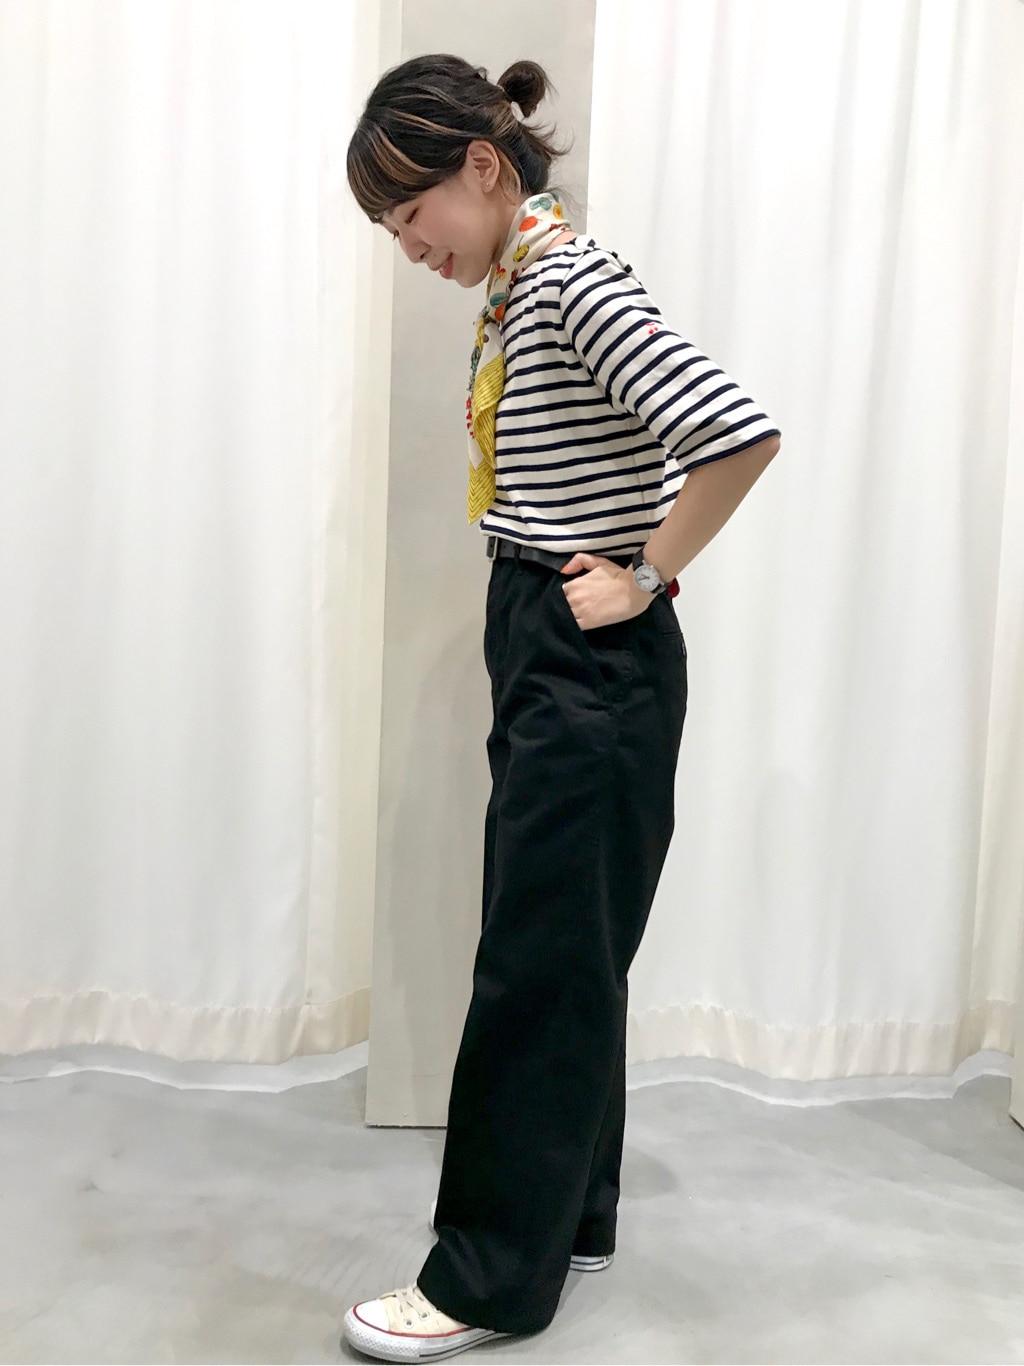 AMB SHOP PAR ICI CHILD WOMAN , PAR ICI 東京スカイツリータウン・ソラマチ 身長:154cm 2020.07.29